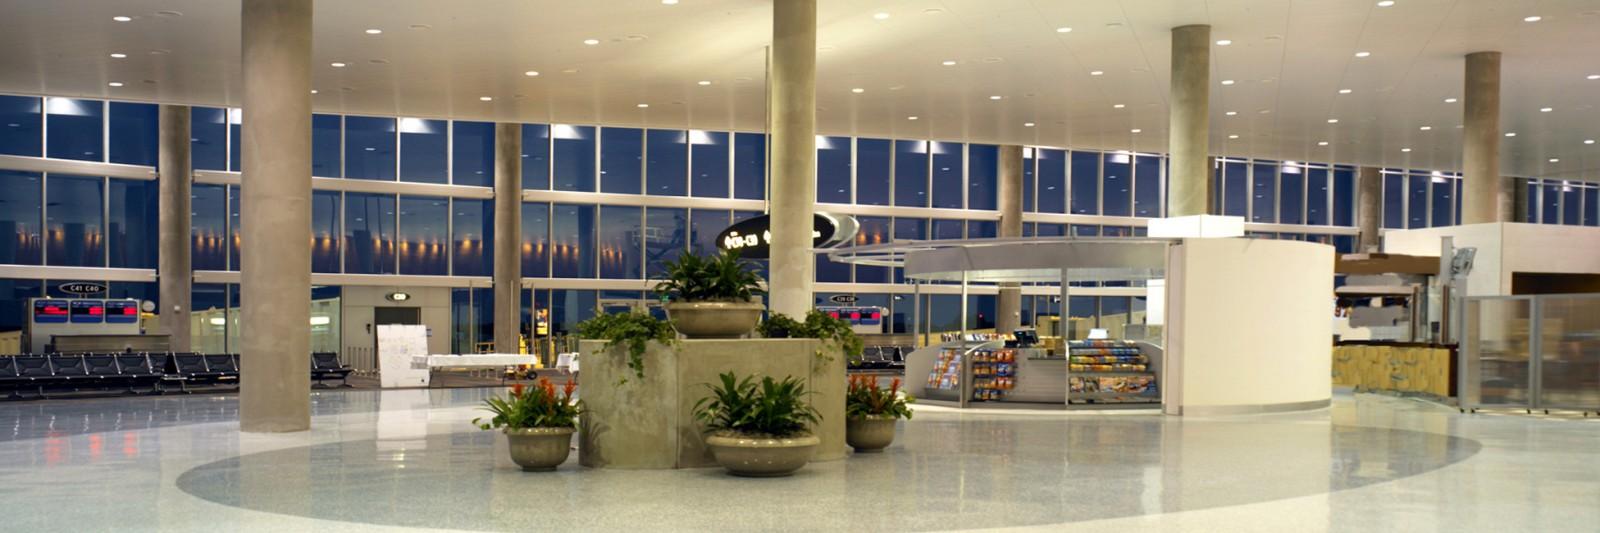 Tampa International Airport Airside C Terminal The Beck